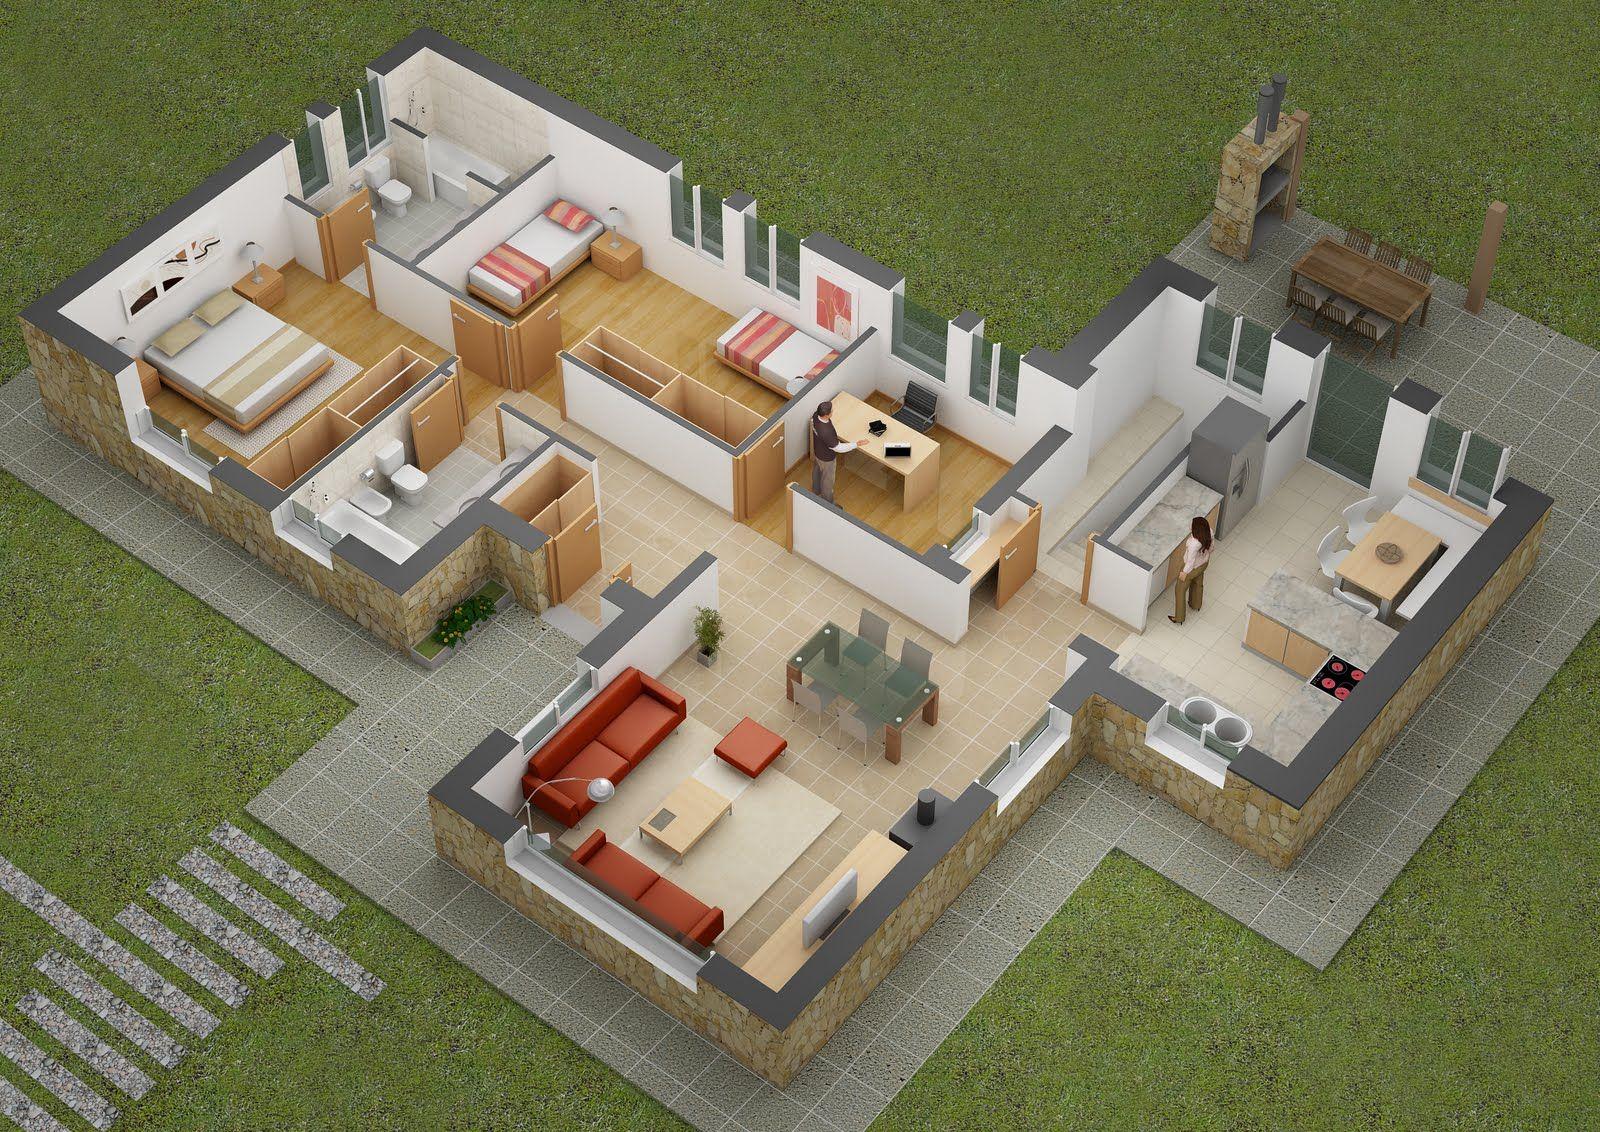 4 Storey Apartment Building Plan Exceptional quotes House Designer kitchen